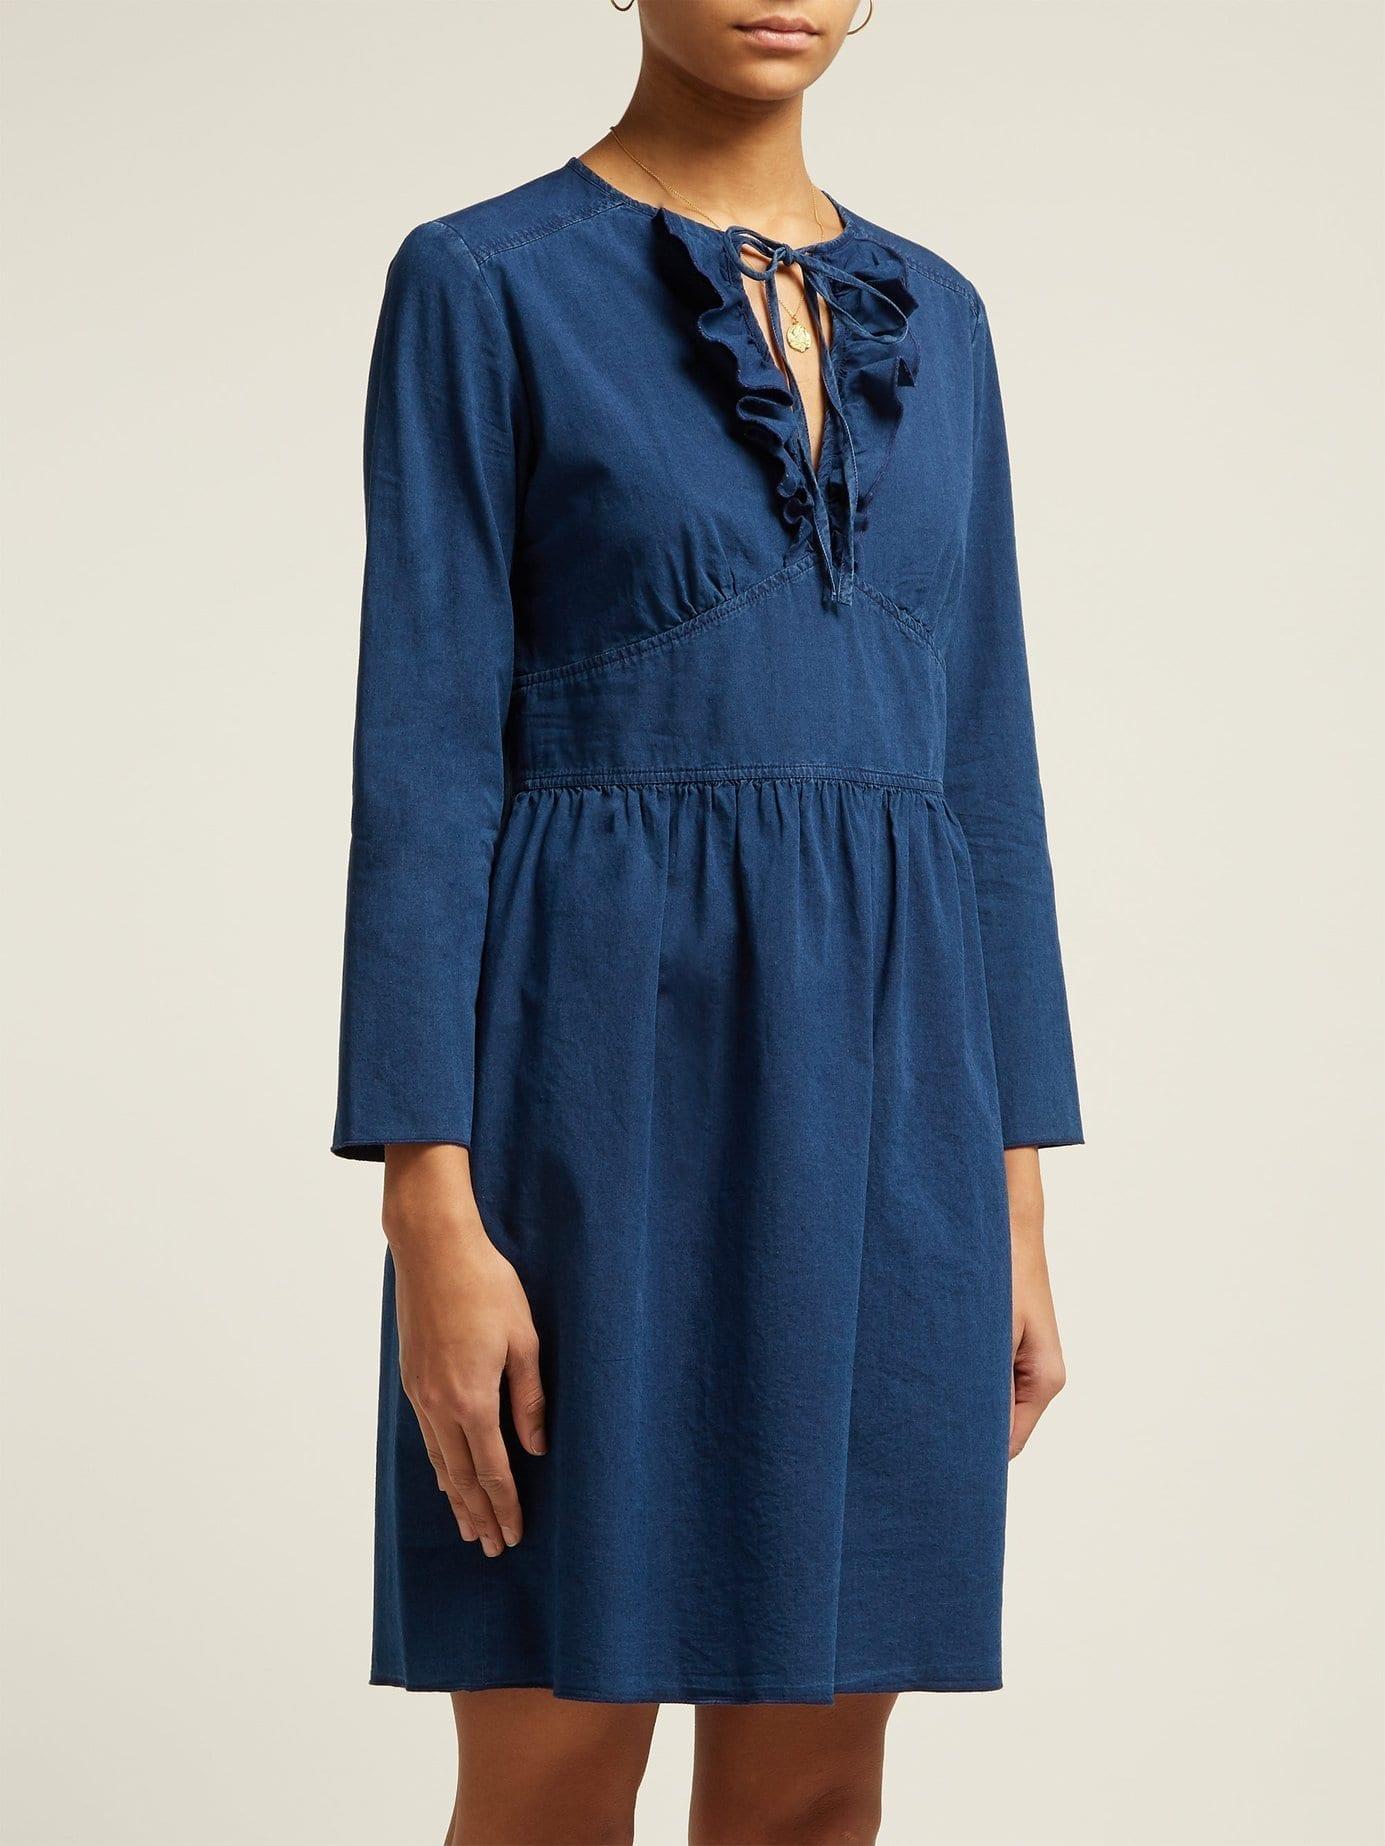 apc poppy cottonchambray indigo blue dress we select